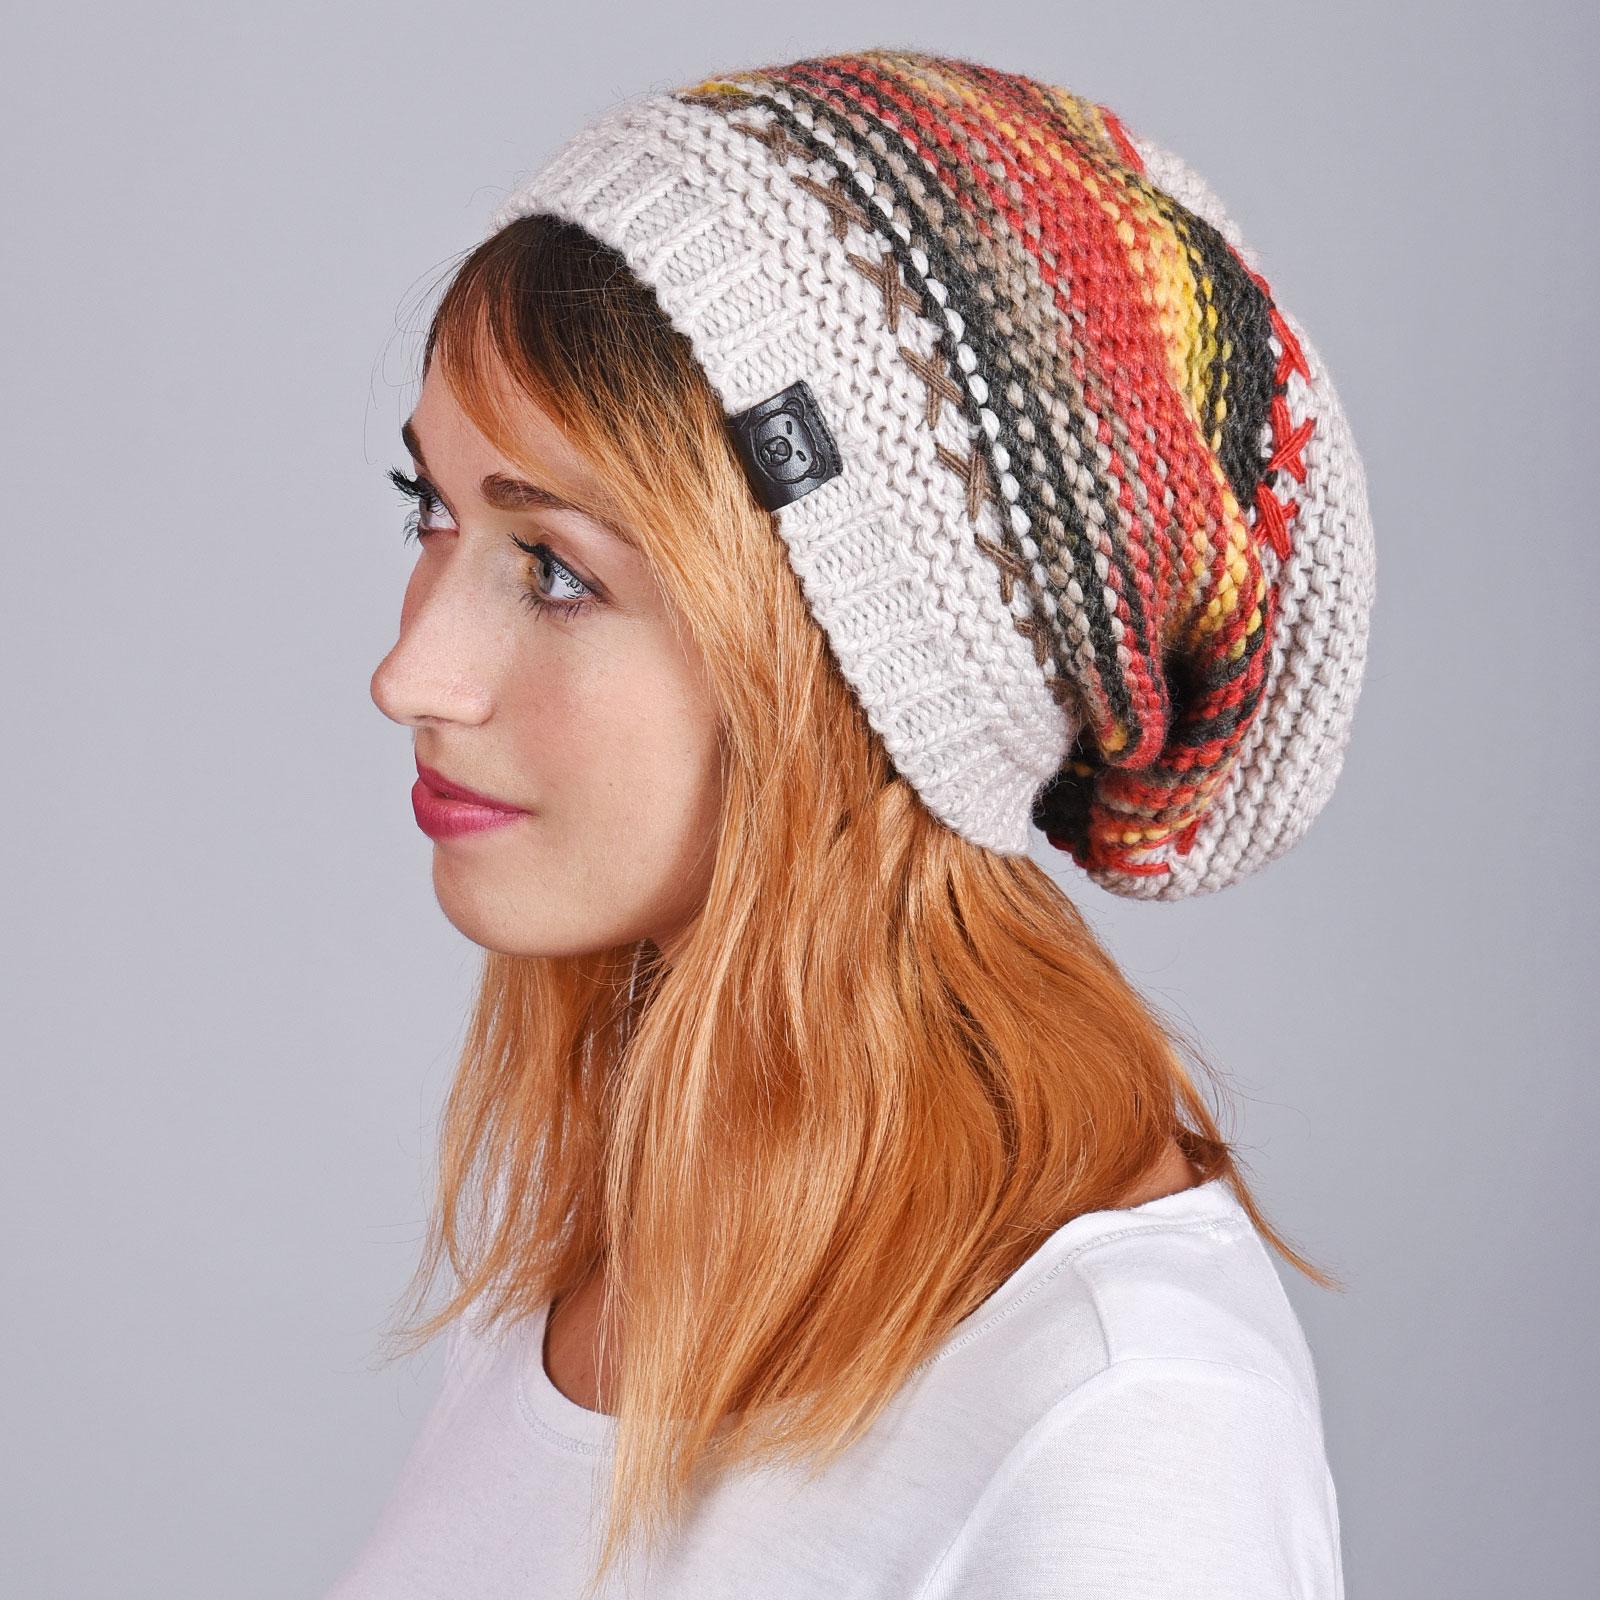 CP-01035-VF16-1-bonnet-femme-blanc-loose